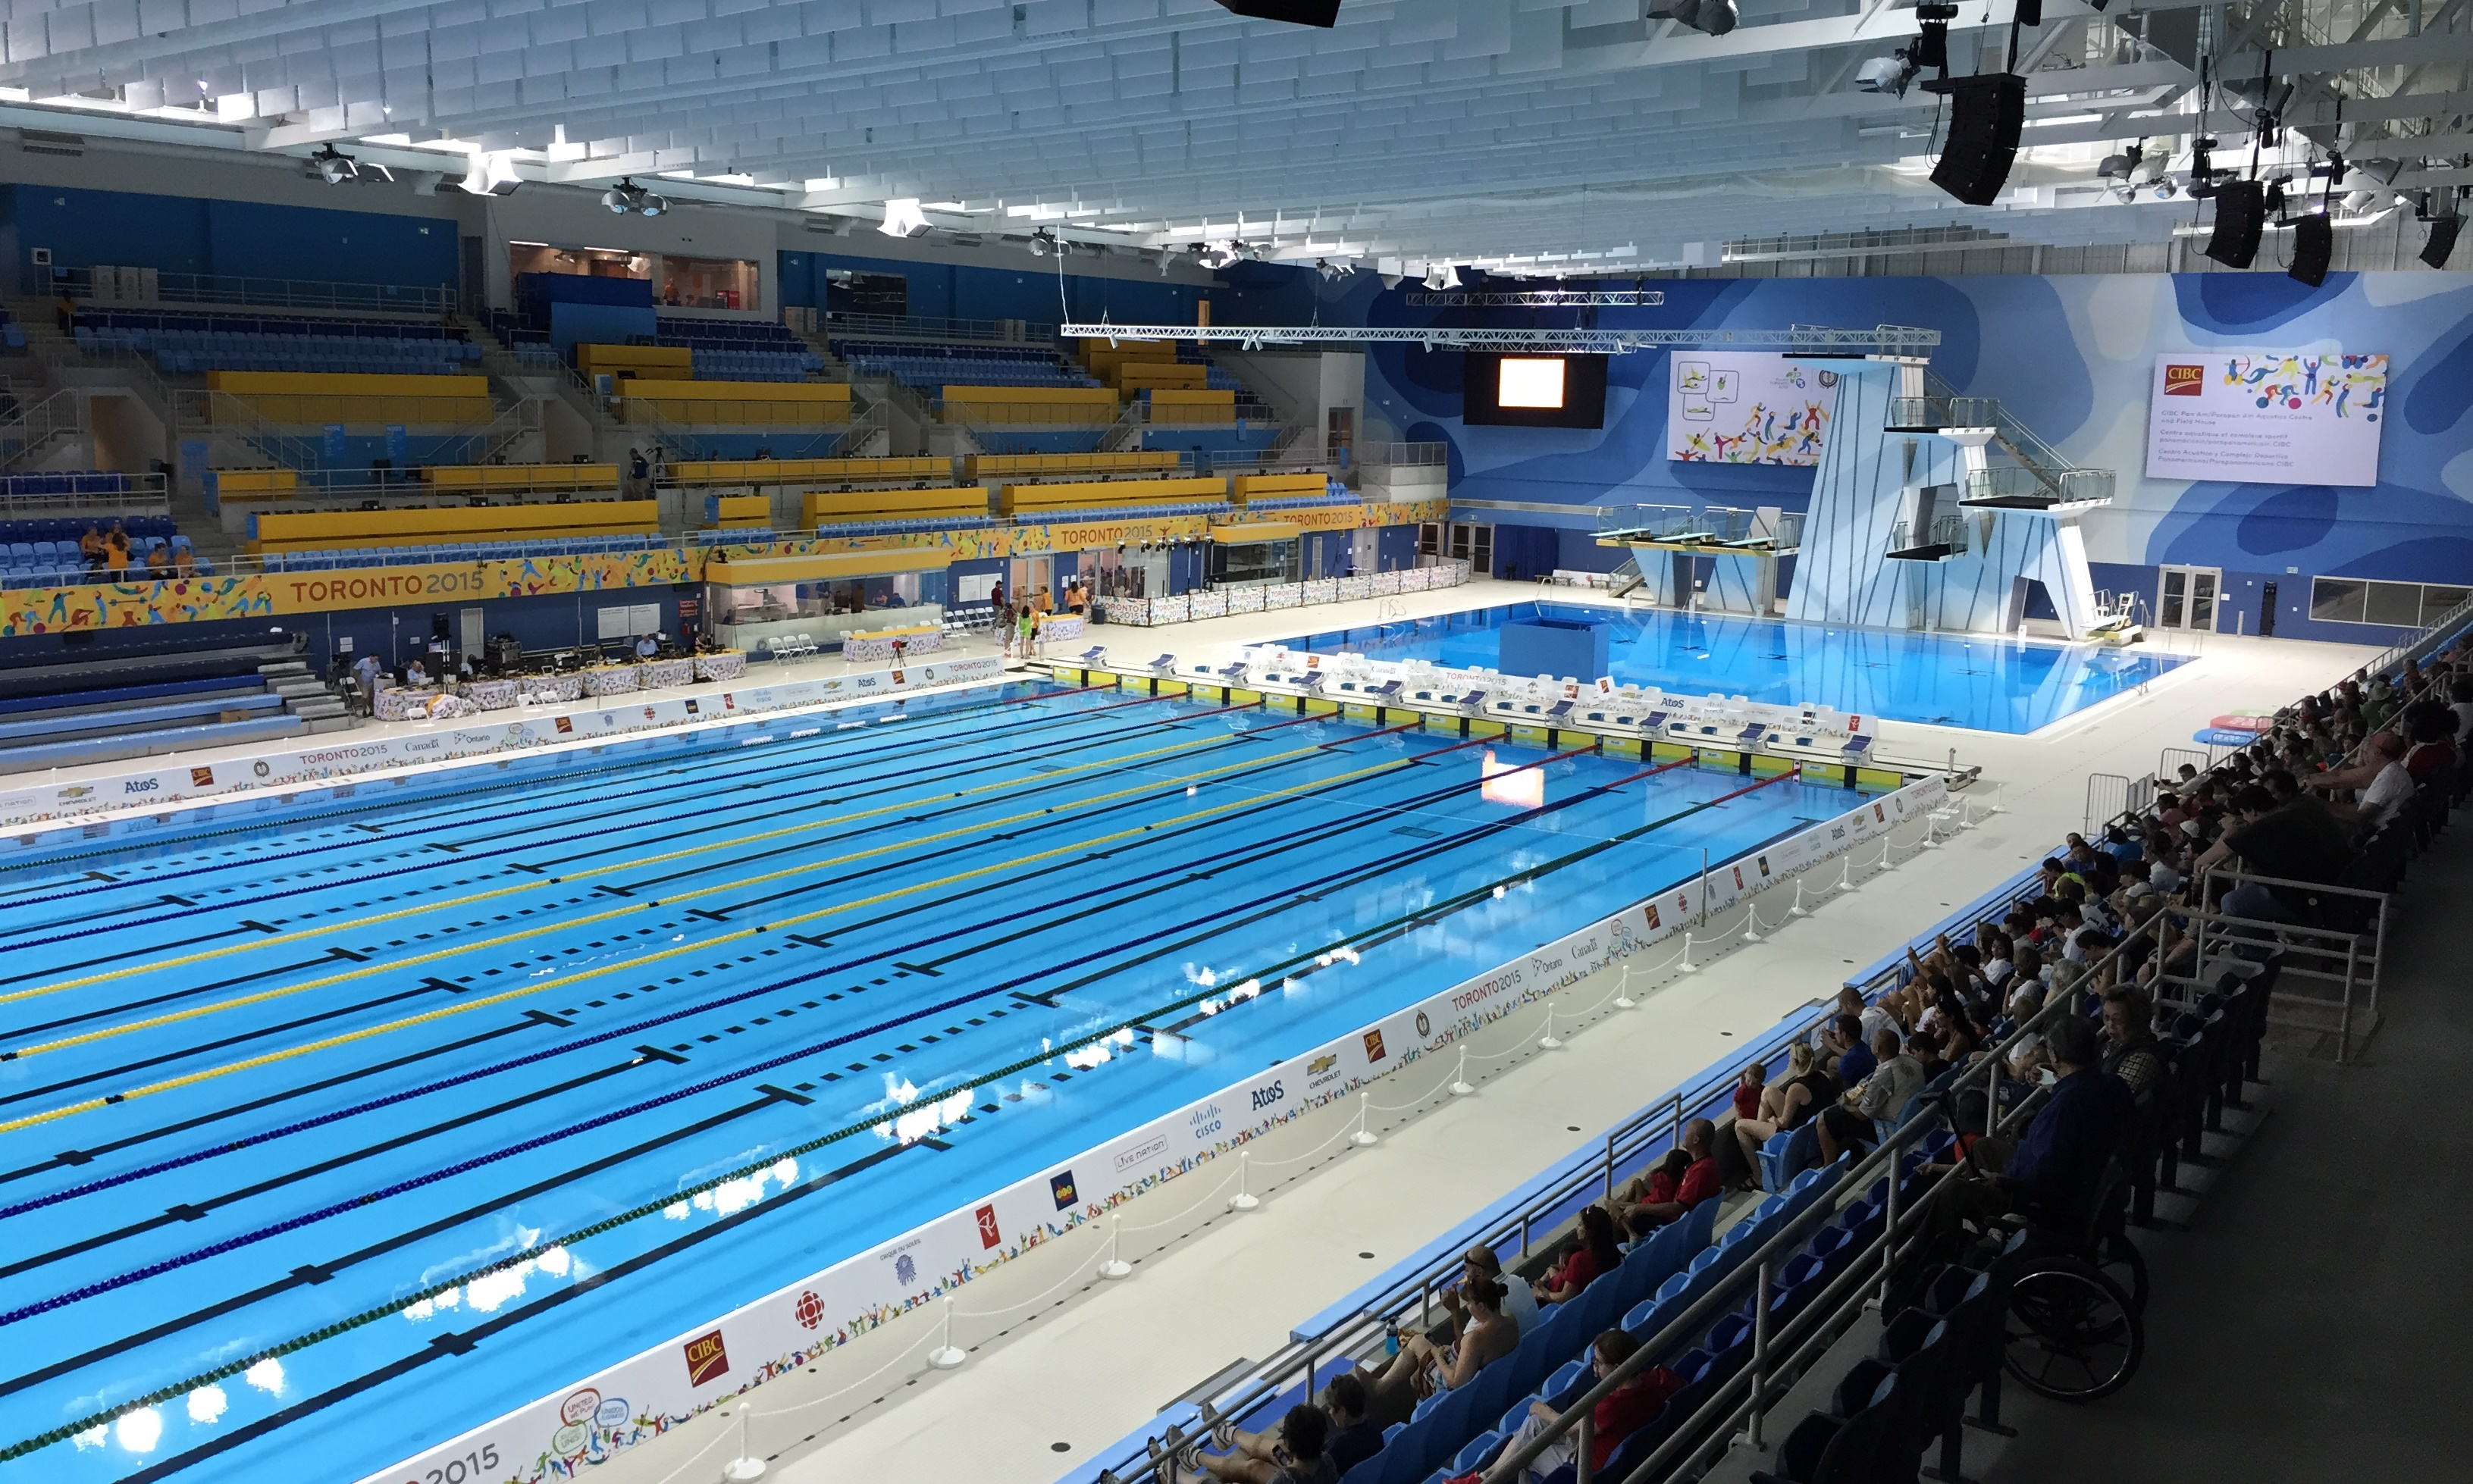 filetoronto pan am sports centre main pool pan am gamesjpg - Olympic Swimming Pool 2015